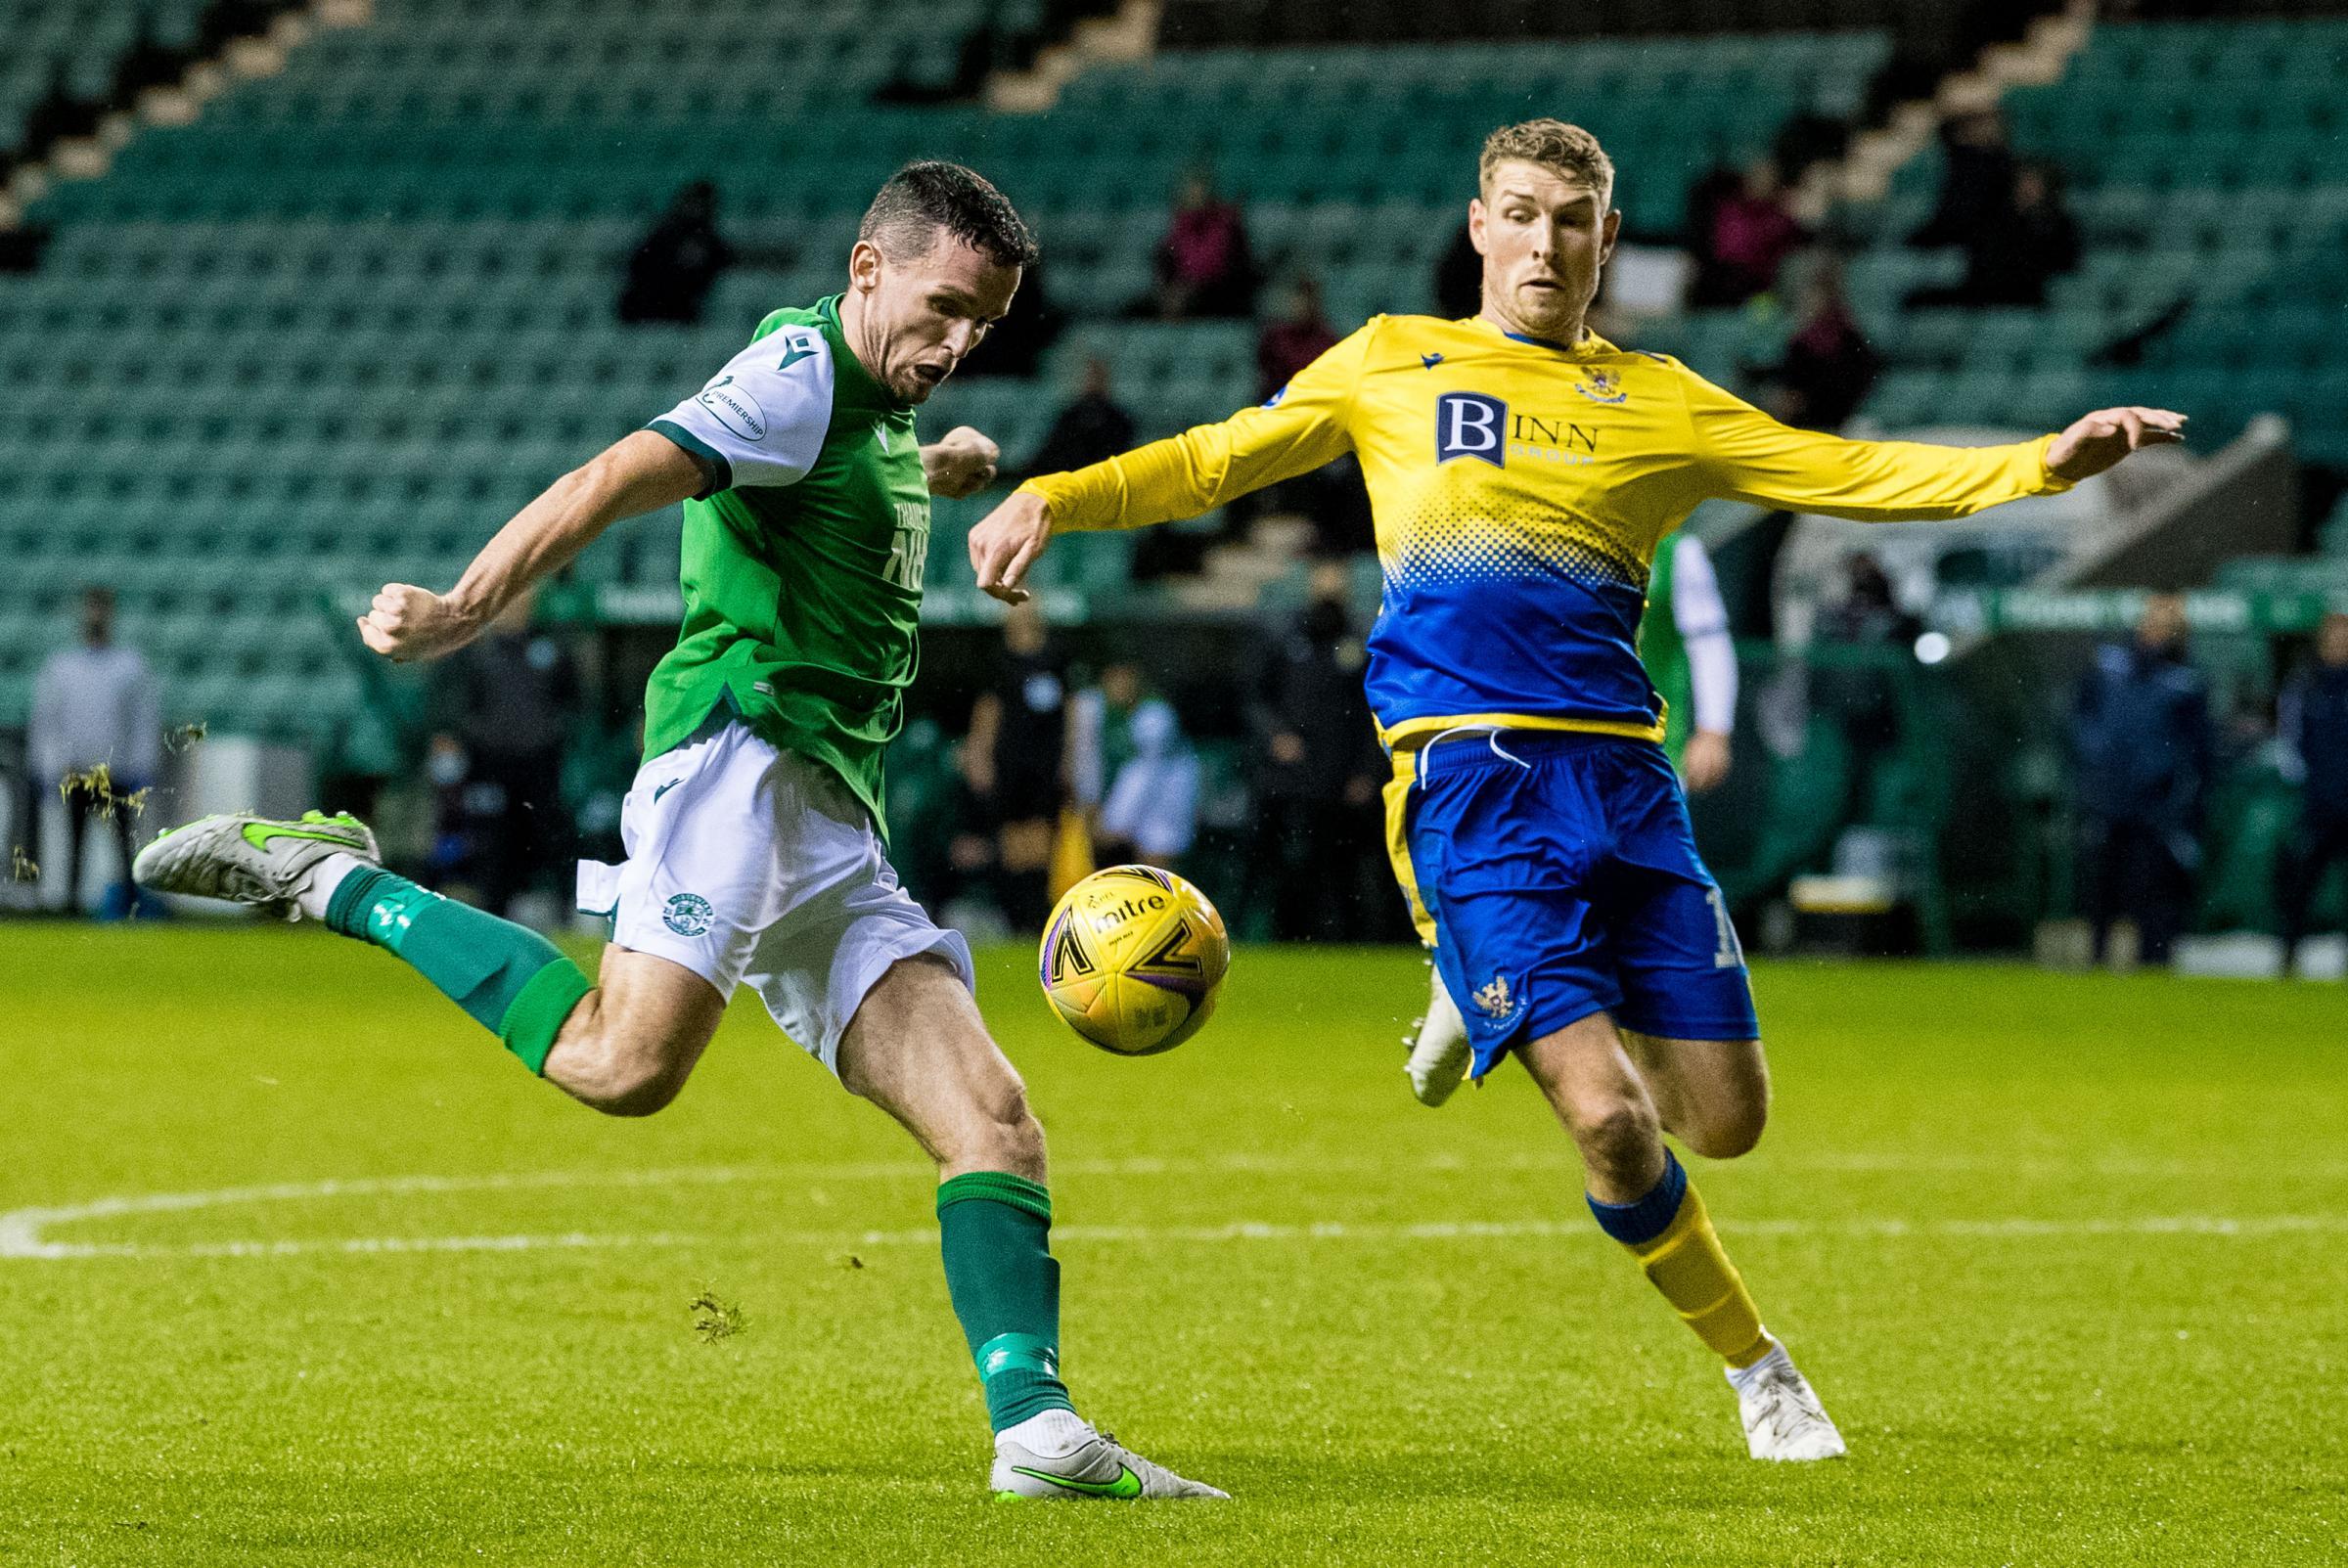 St Johnstone vs Hibs live stream: How to watch Betfred Cup semi-final showdown